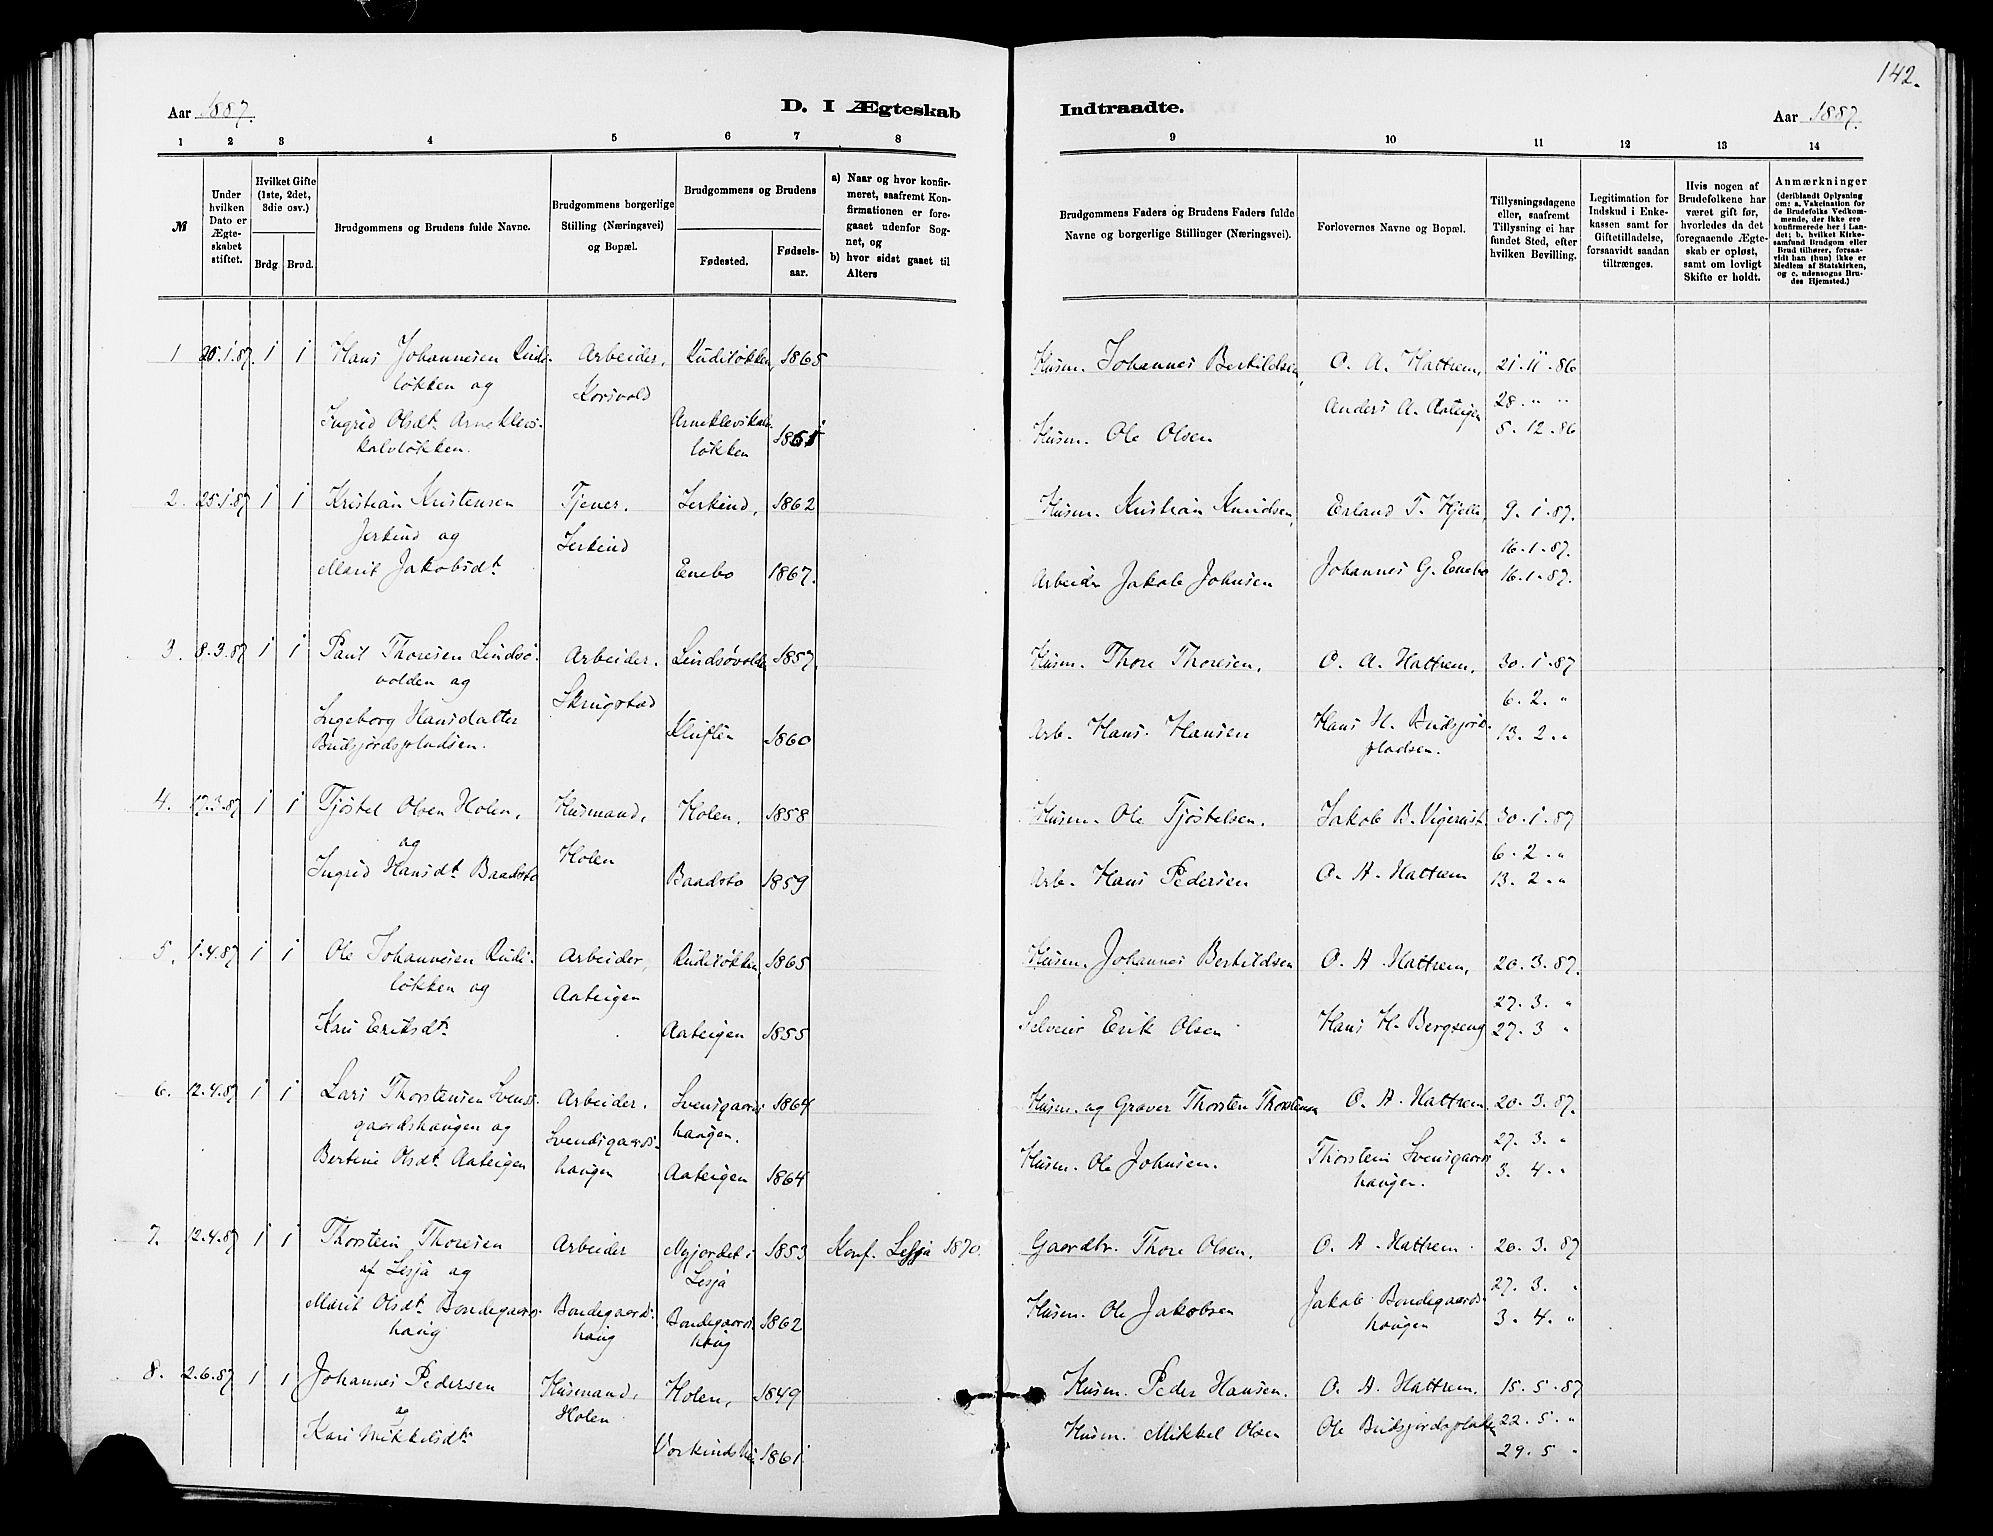 SAH, Dovre prestekontor, Ministerialbok nr. 2, 1879-1890, s. 142